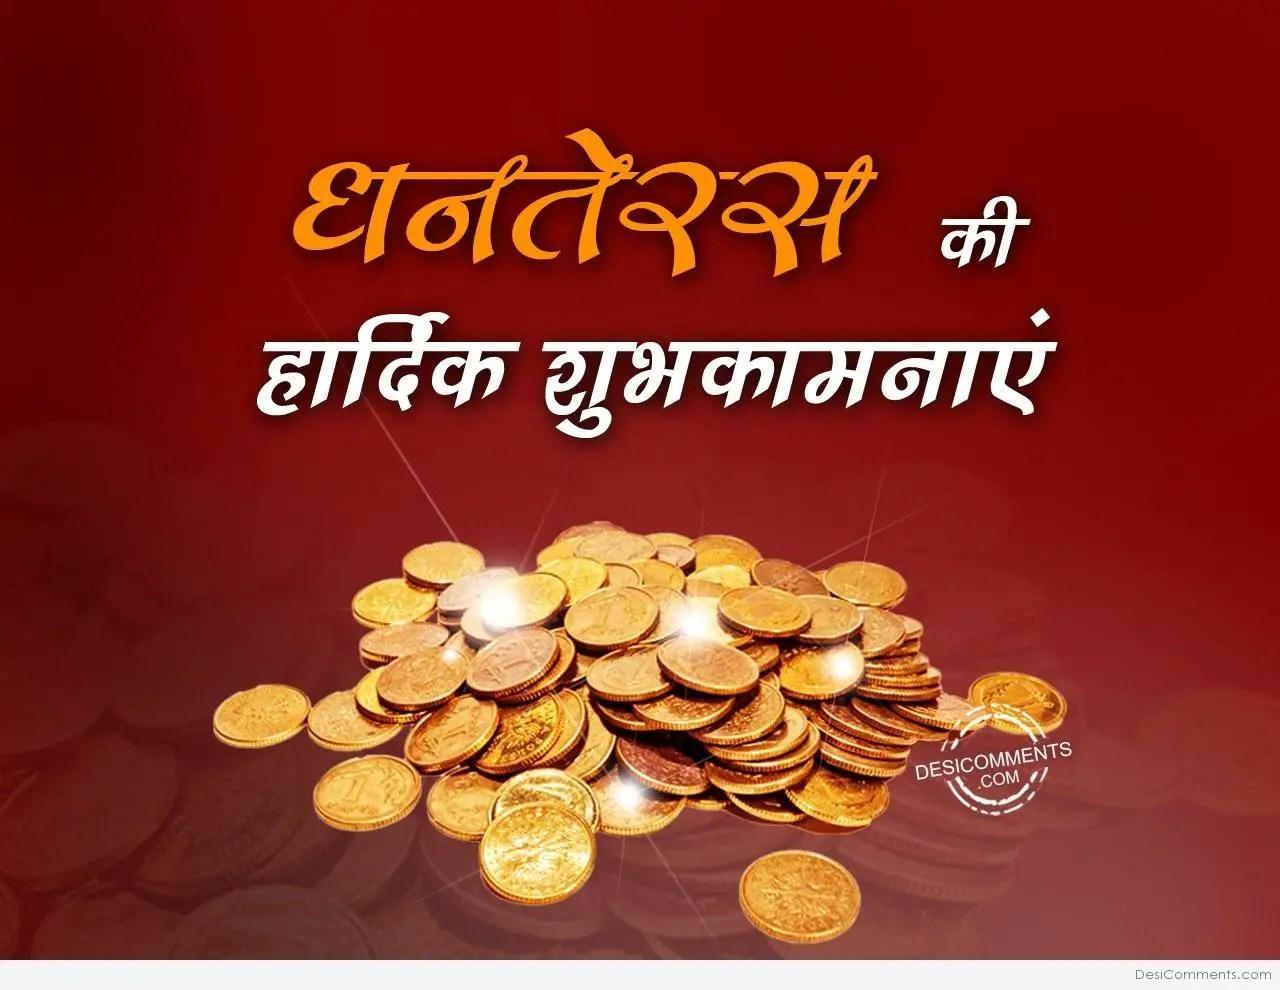 Sad Love Quotes Wallpapers Free Download In Hindi Dhanteras Ki Hardik Shubhkamnaye Desicomments Com